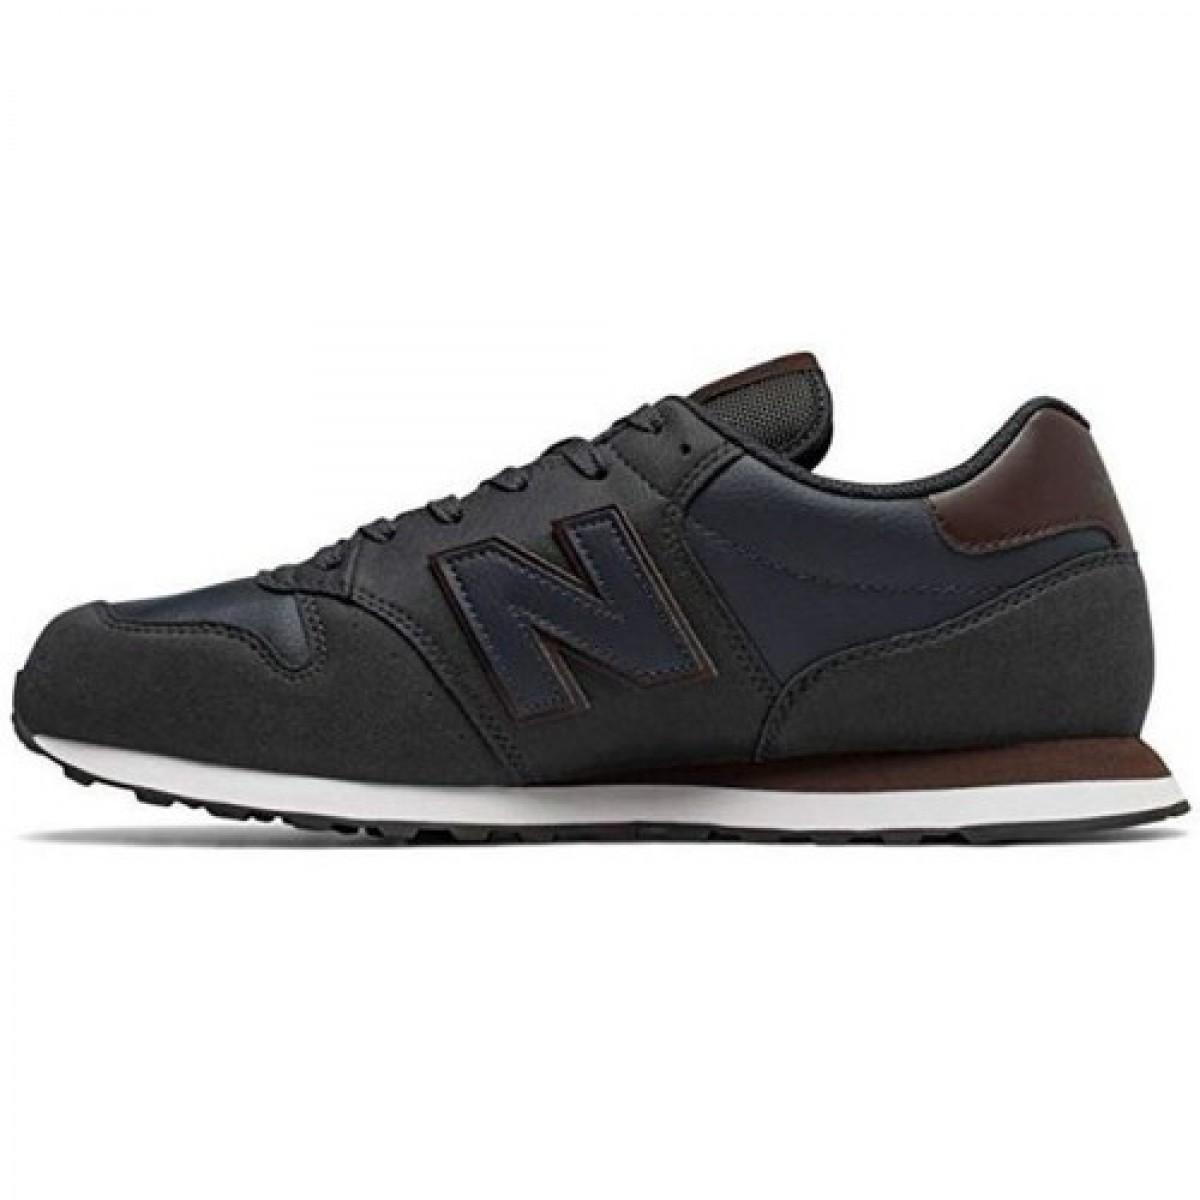 Sneakers New balance Uomo Gm500nvb Navy